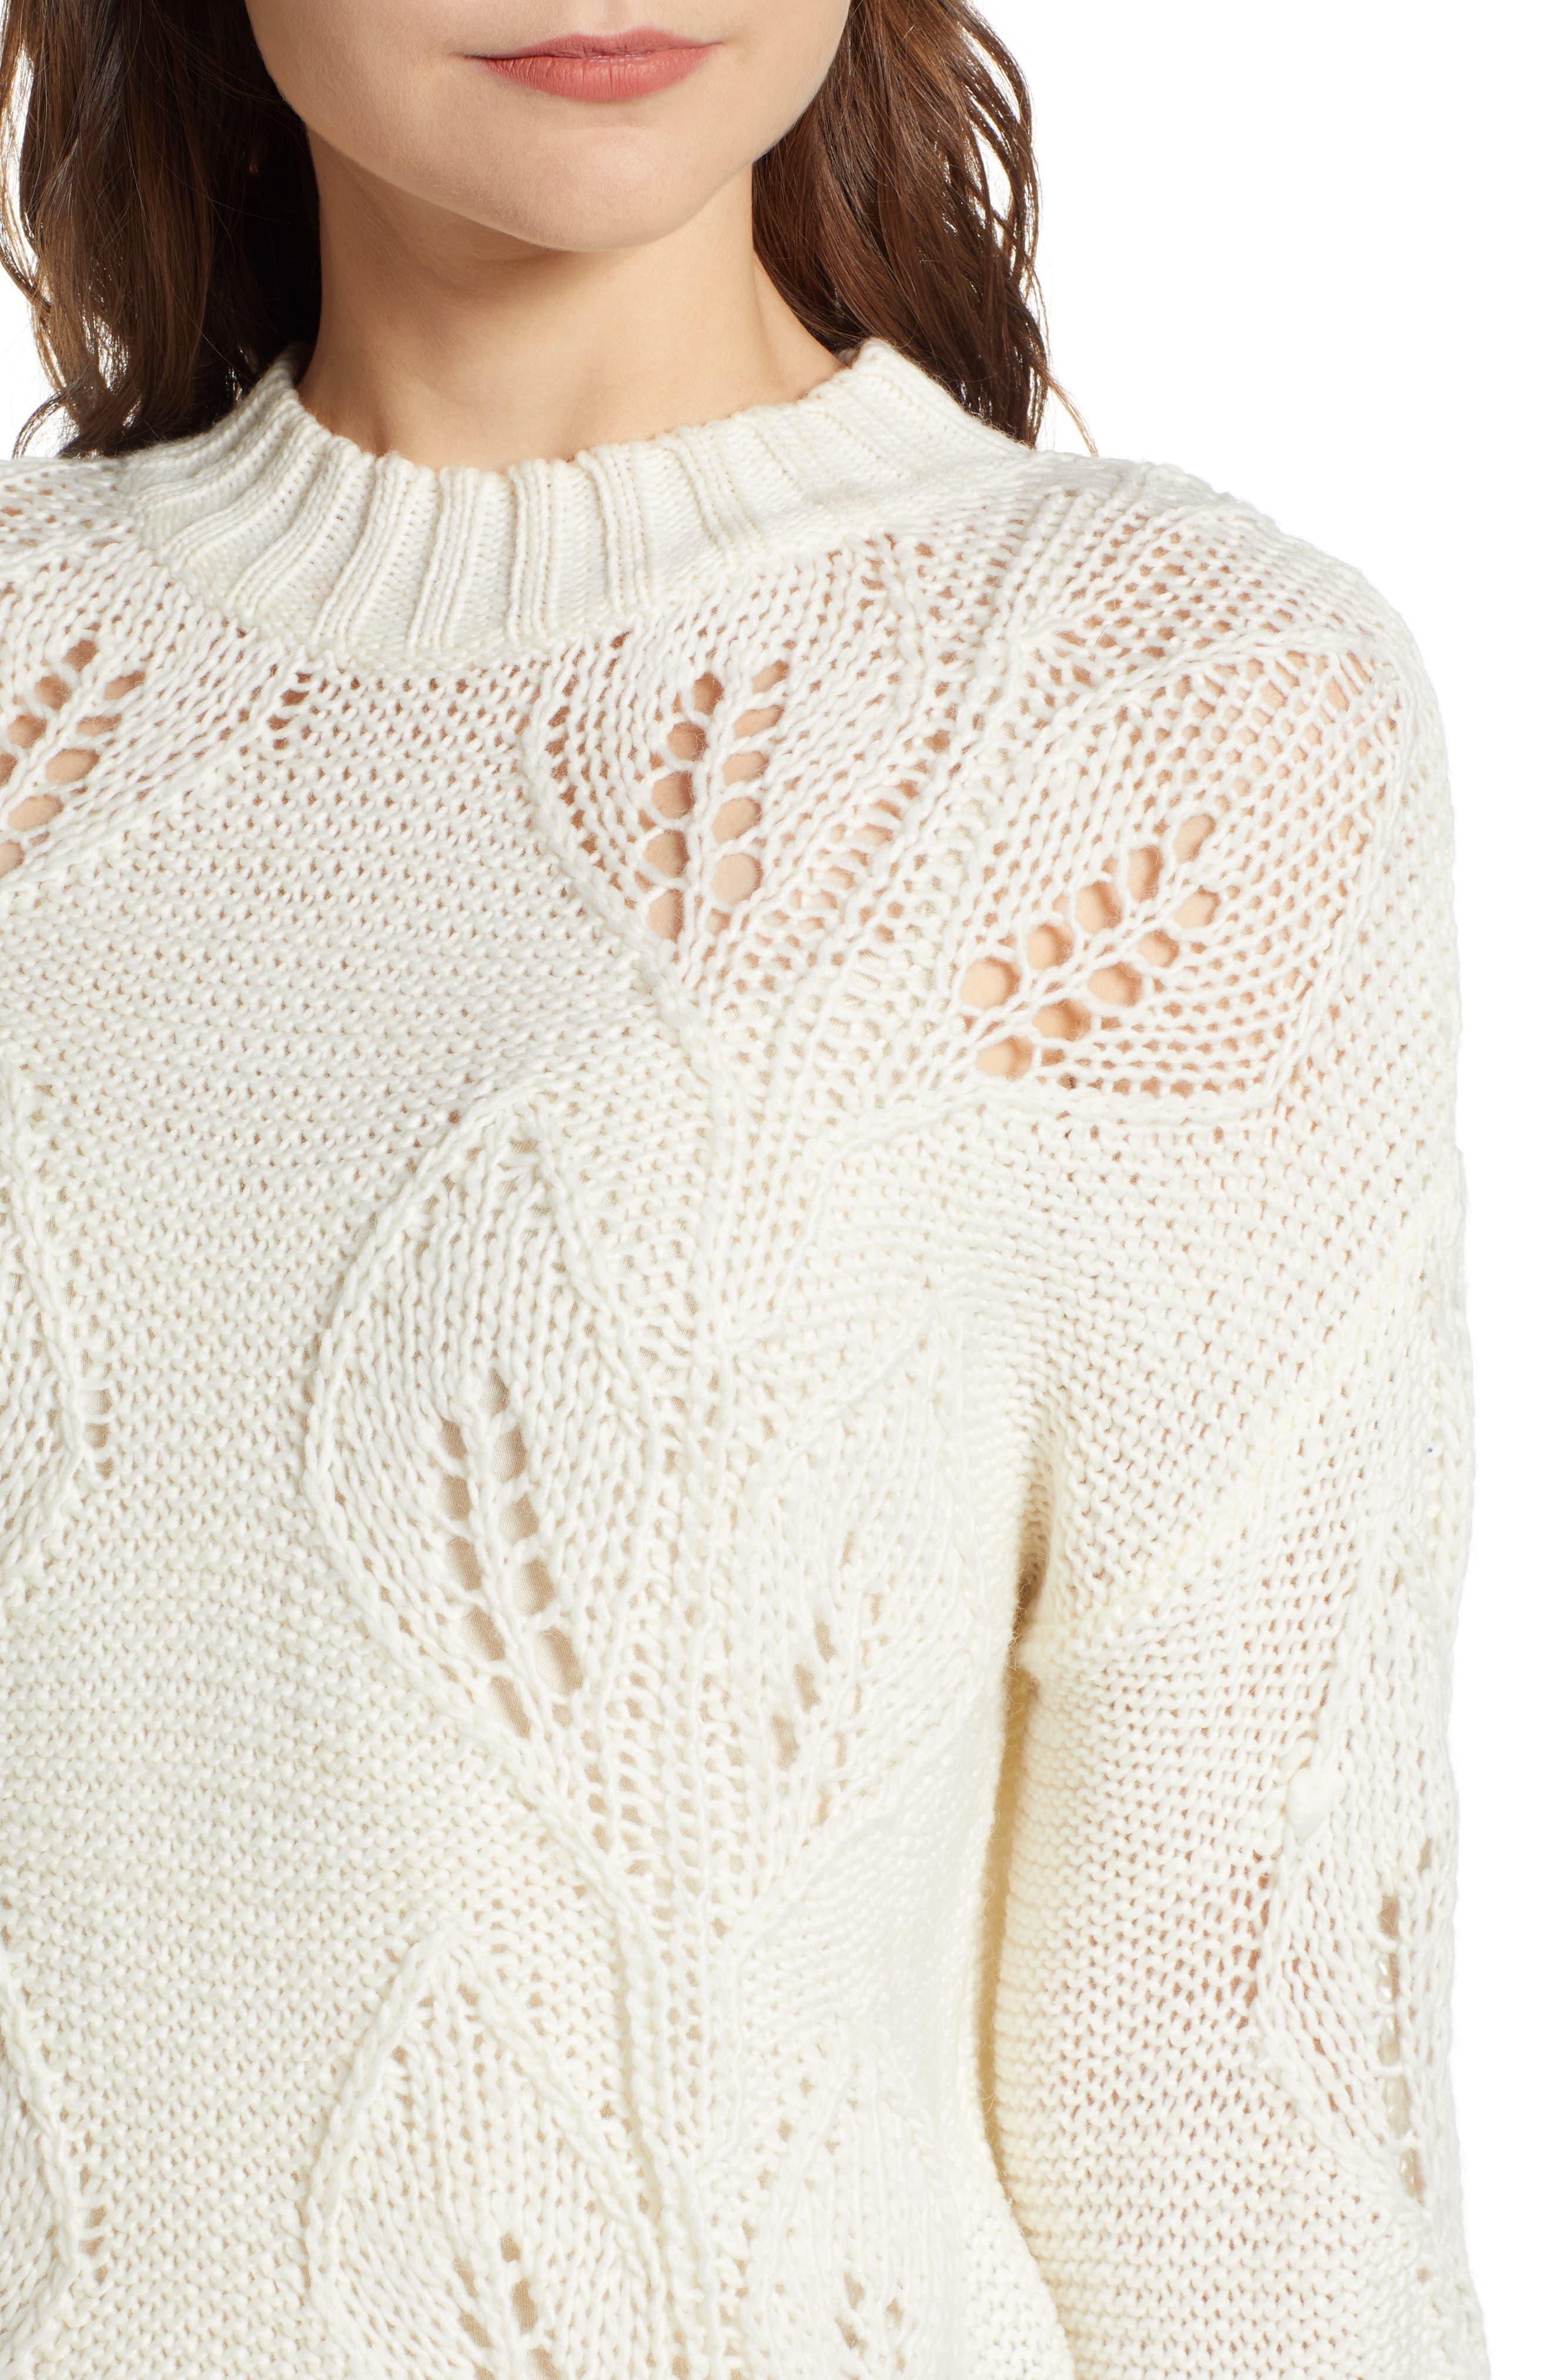 Bishop + Young Botanical Sweater,                             Alternate thumbnail 4, color,                             CREAM